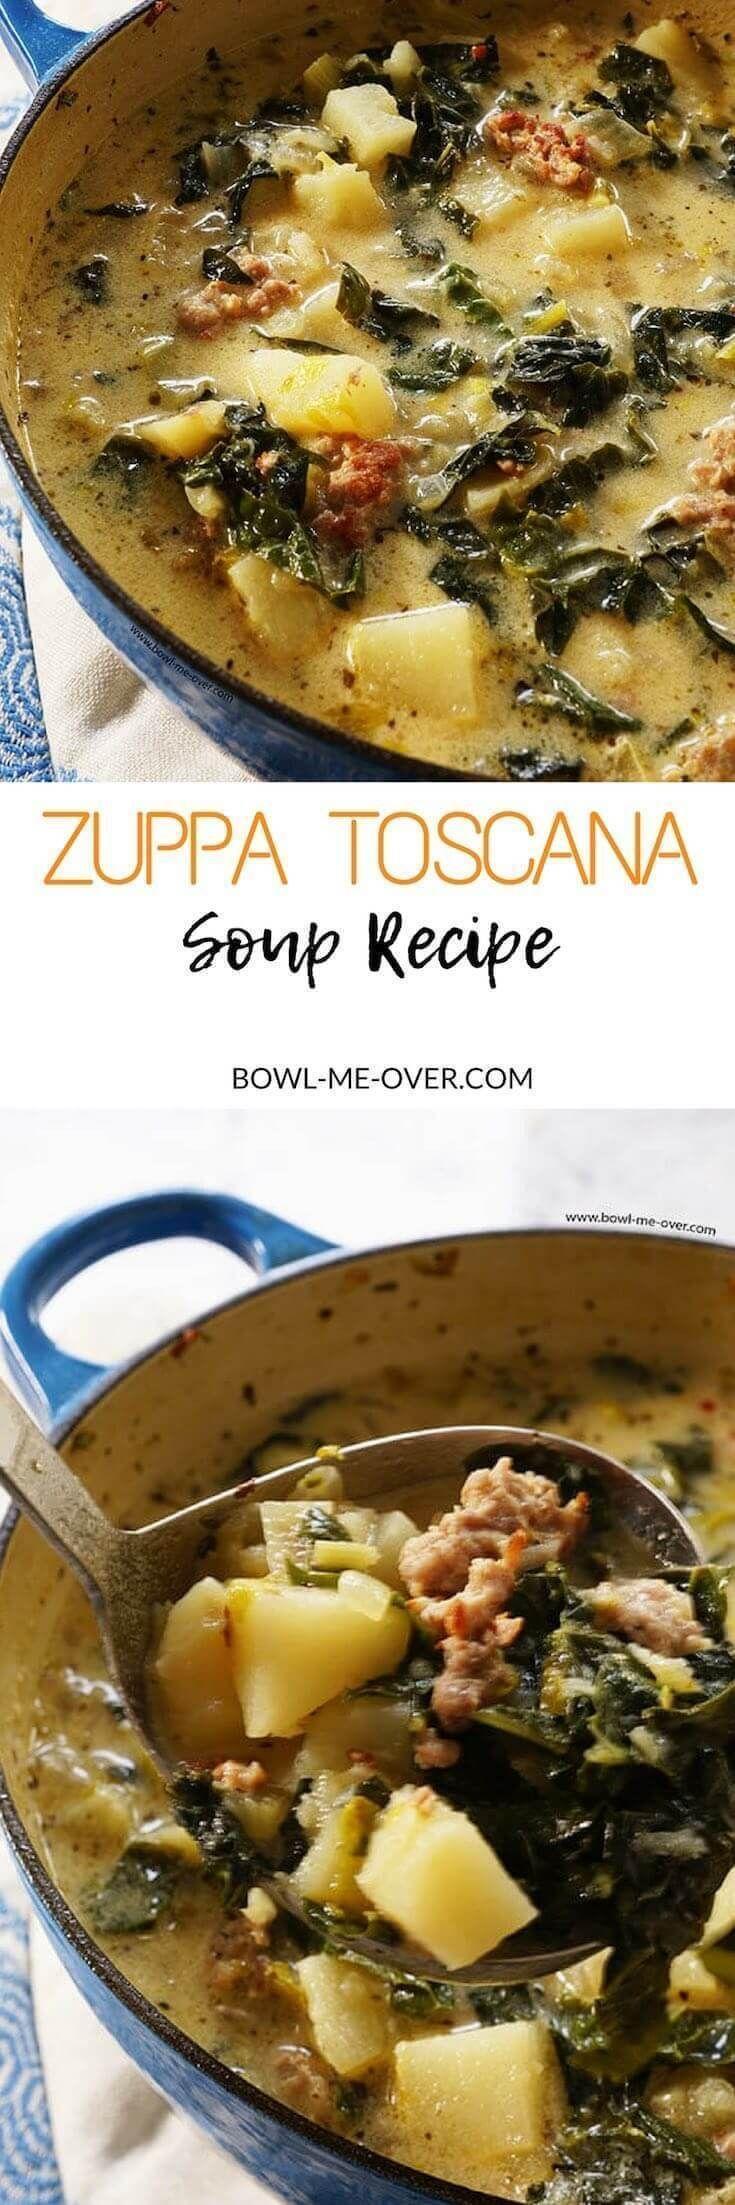 Zuppa Toscana Suppe - #suppe #toscana #zuppa - #Lorine'sZuppaToscanaSuppe #zuppatoscanasoup